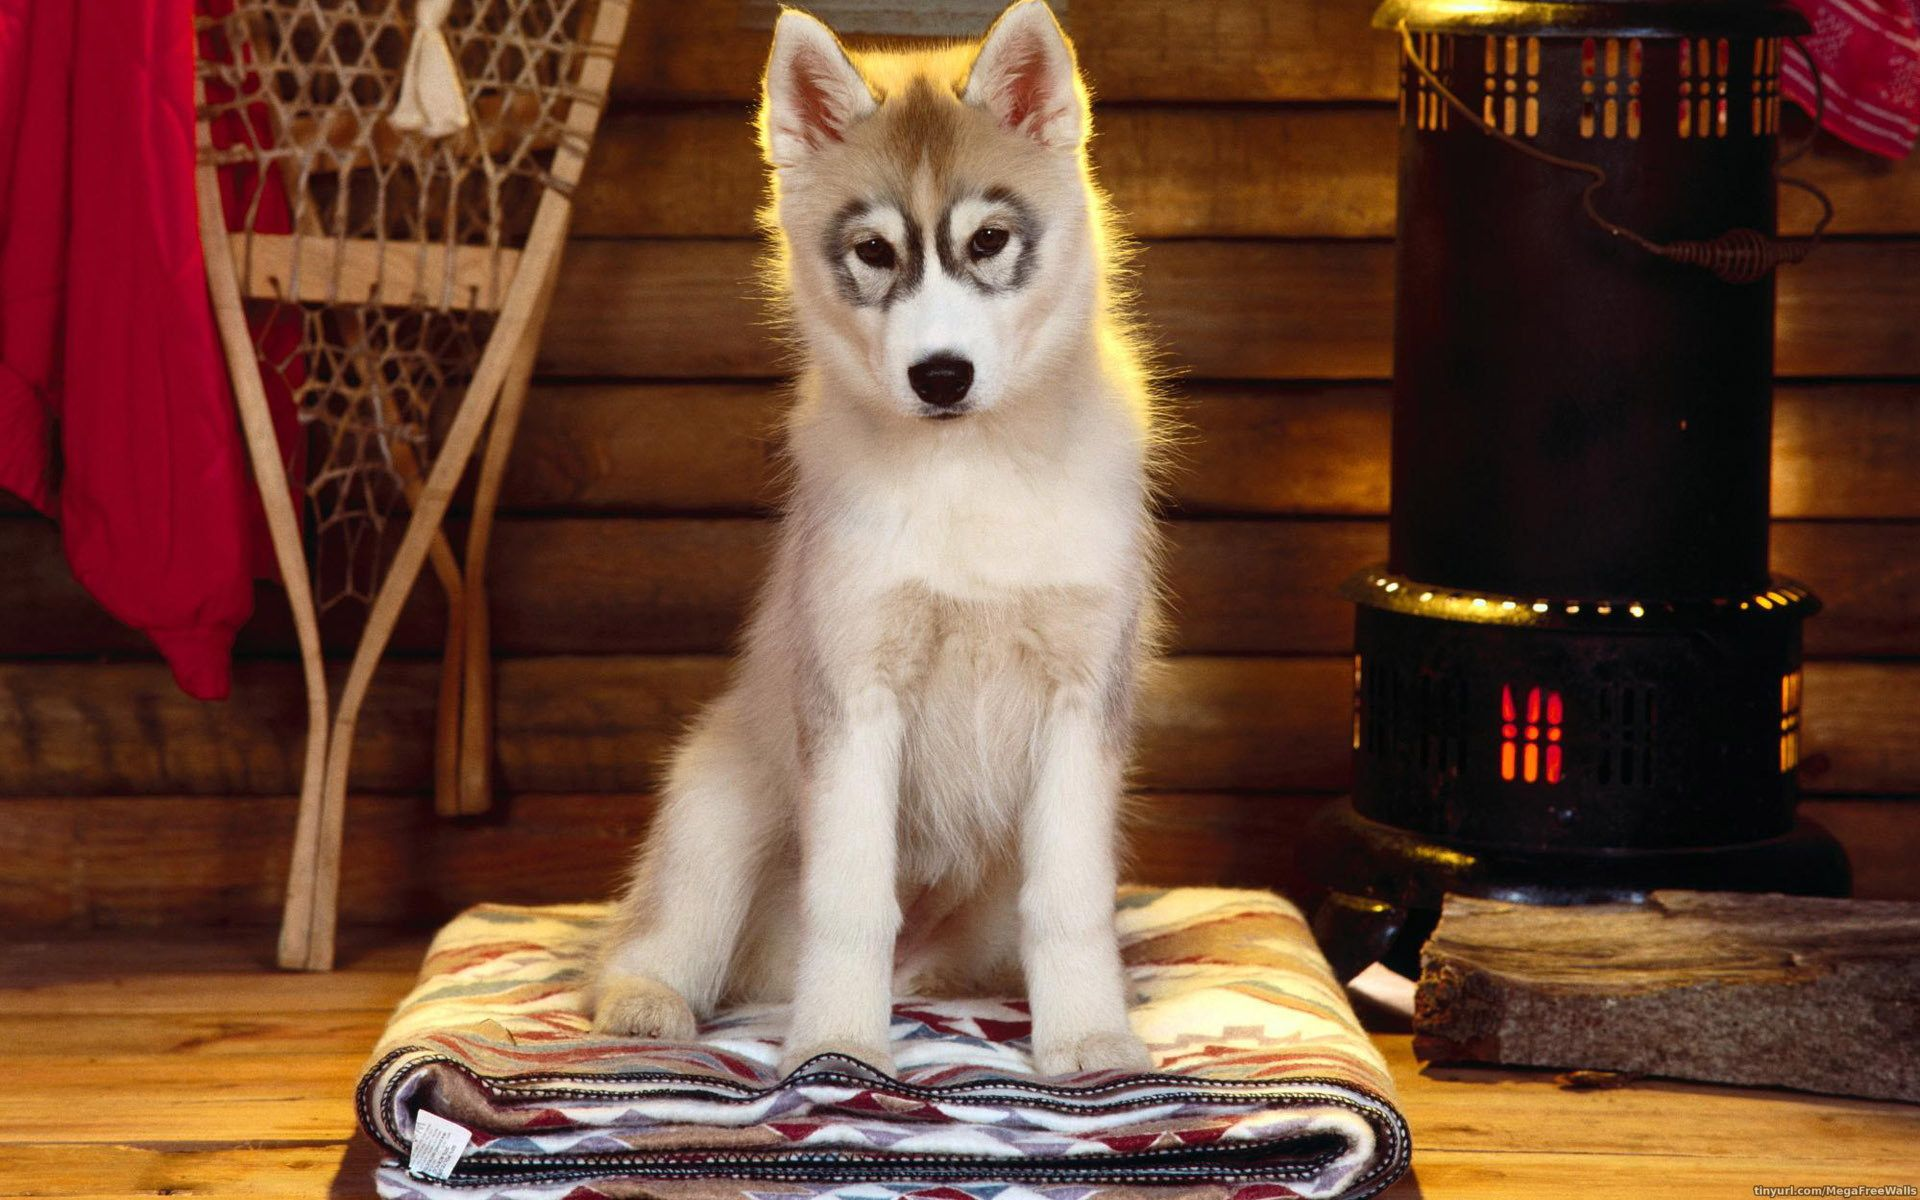 animaux chien mignon husky chiot animaux fond d 39 cran cute pinterest husky. Black Bedroom Furniture Sets. Home Design Ideas